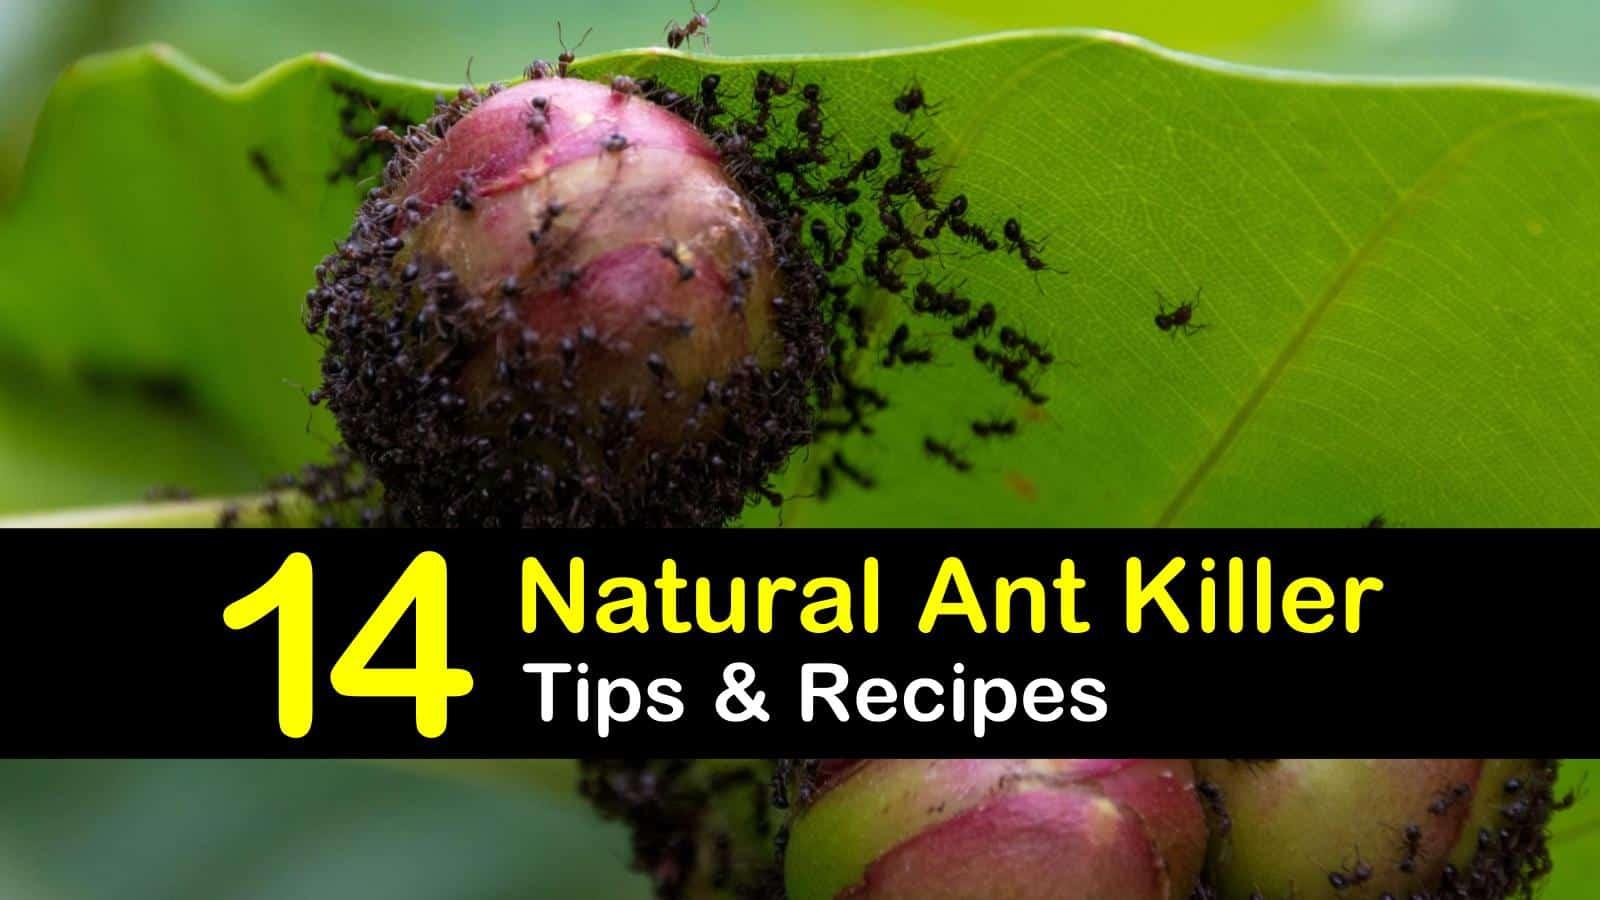 natural ant killer titleimg1